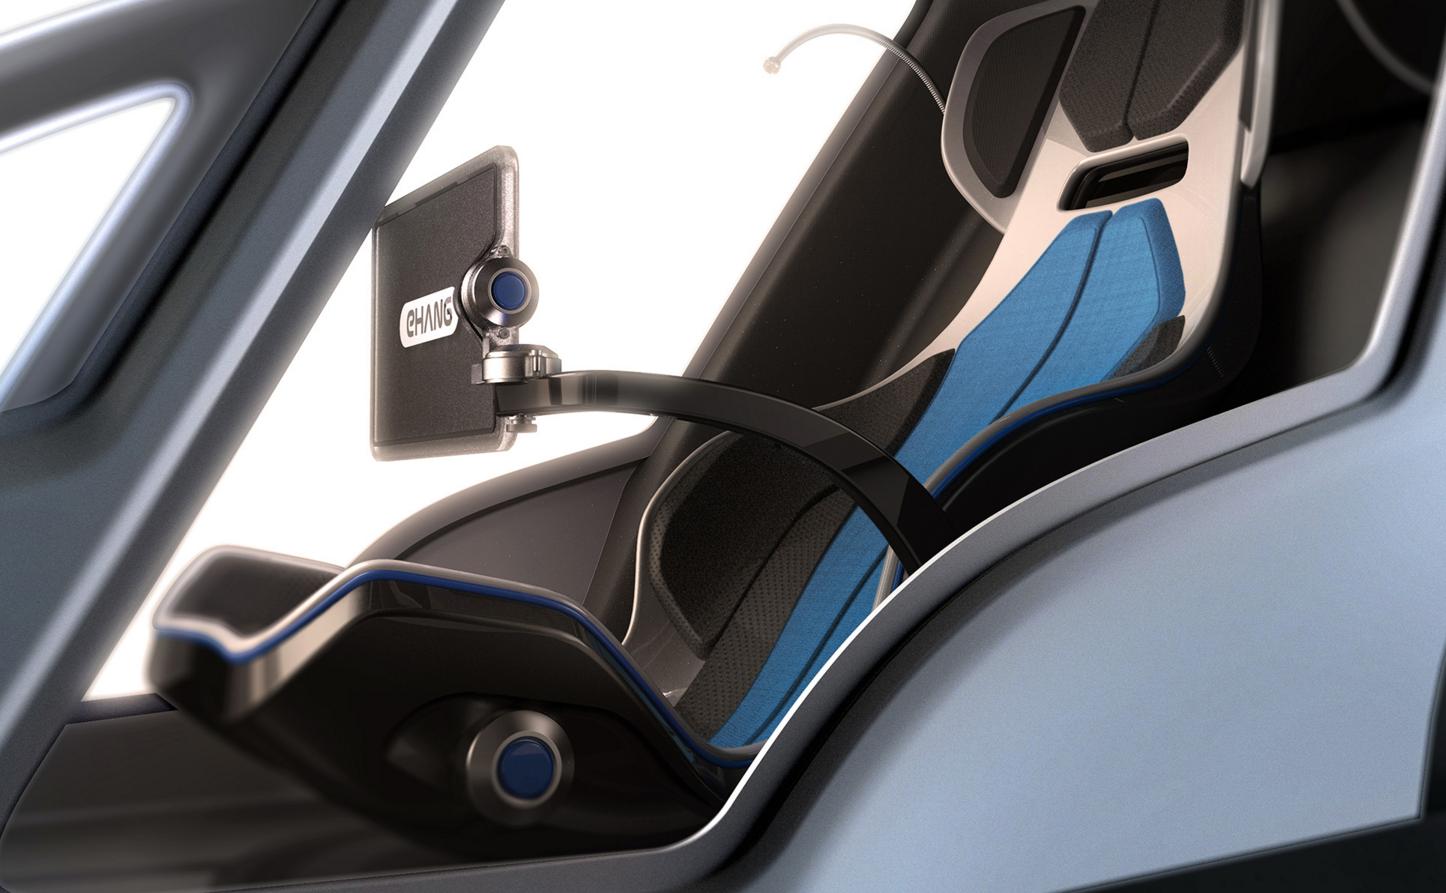 EHang 184 Cockpit